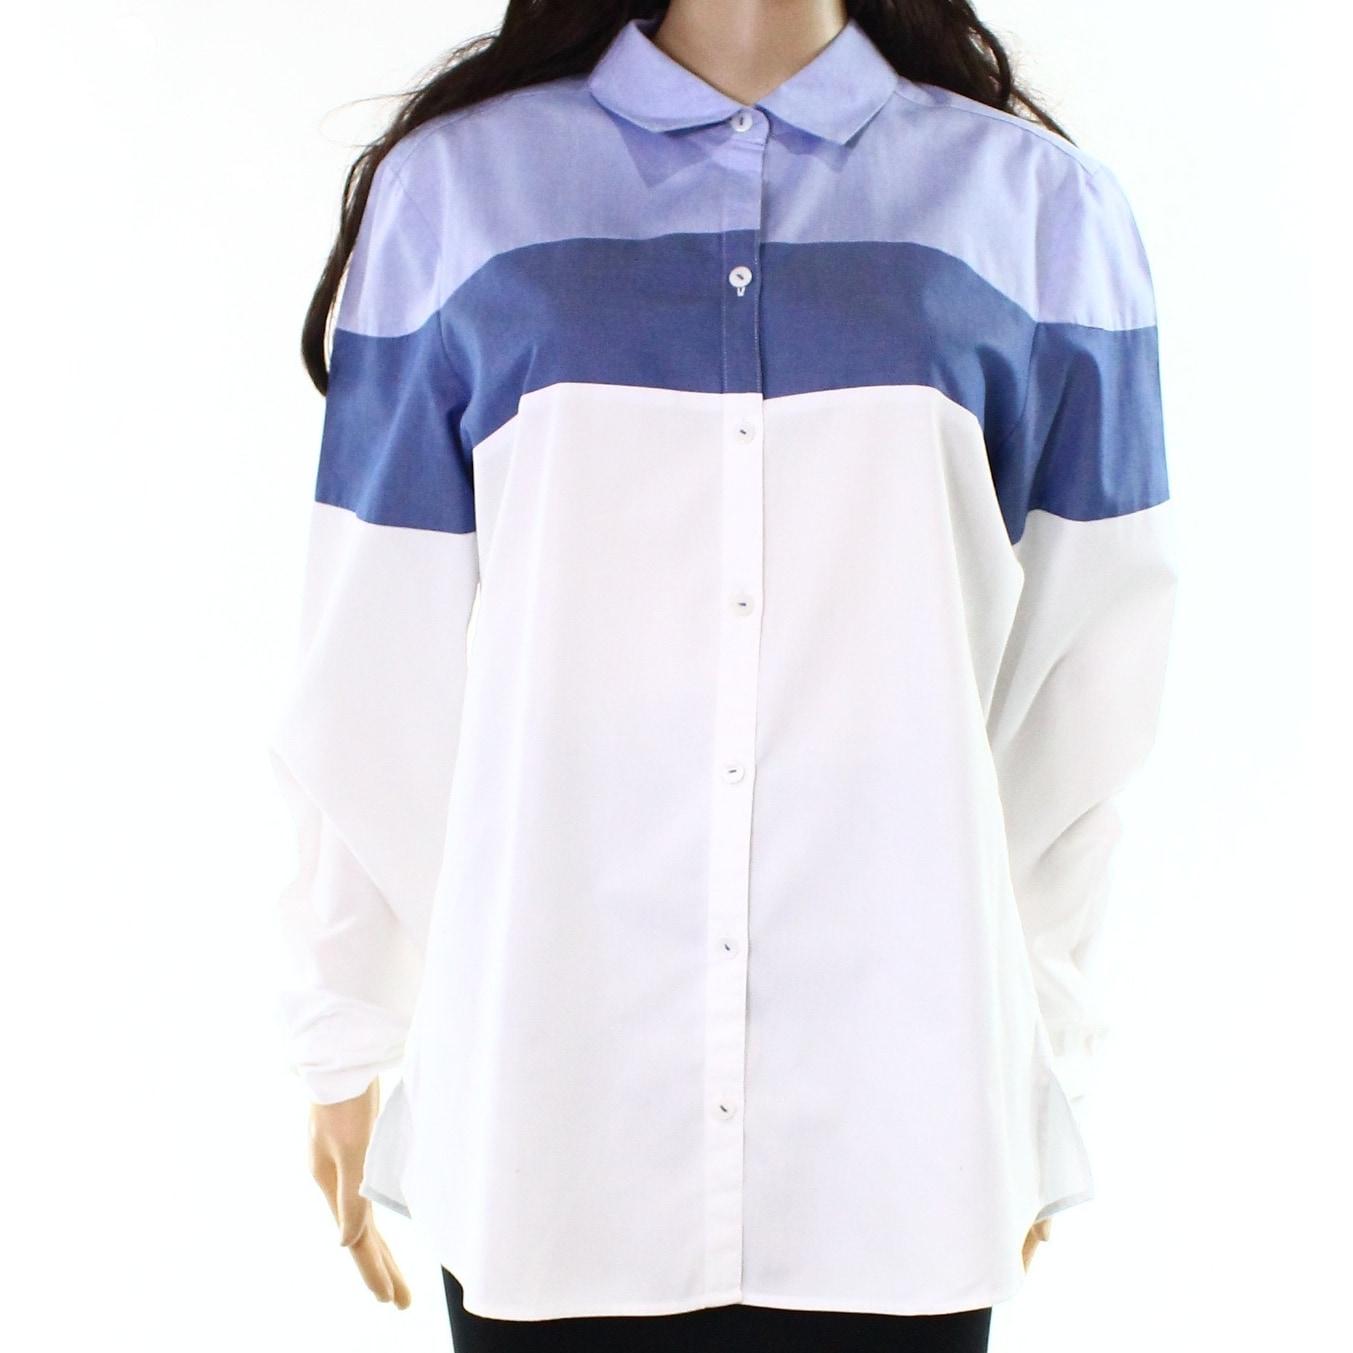 Foxcroft Shirts On Sale Anlis